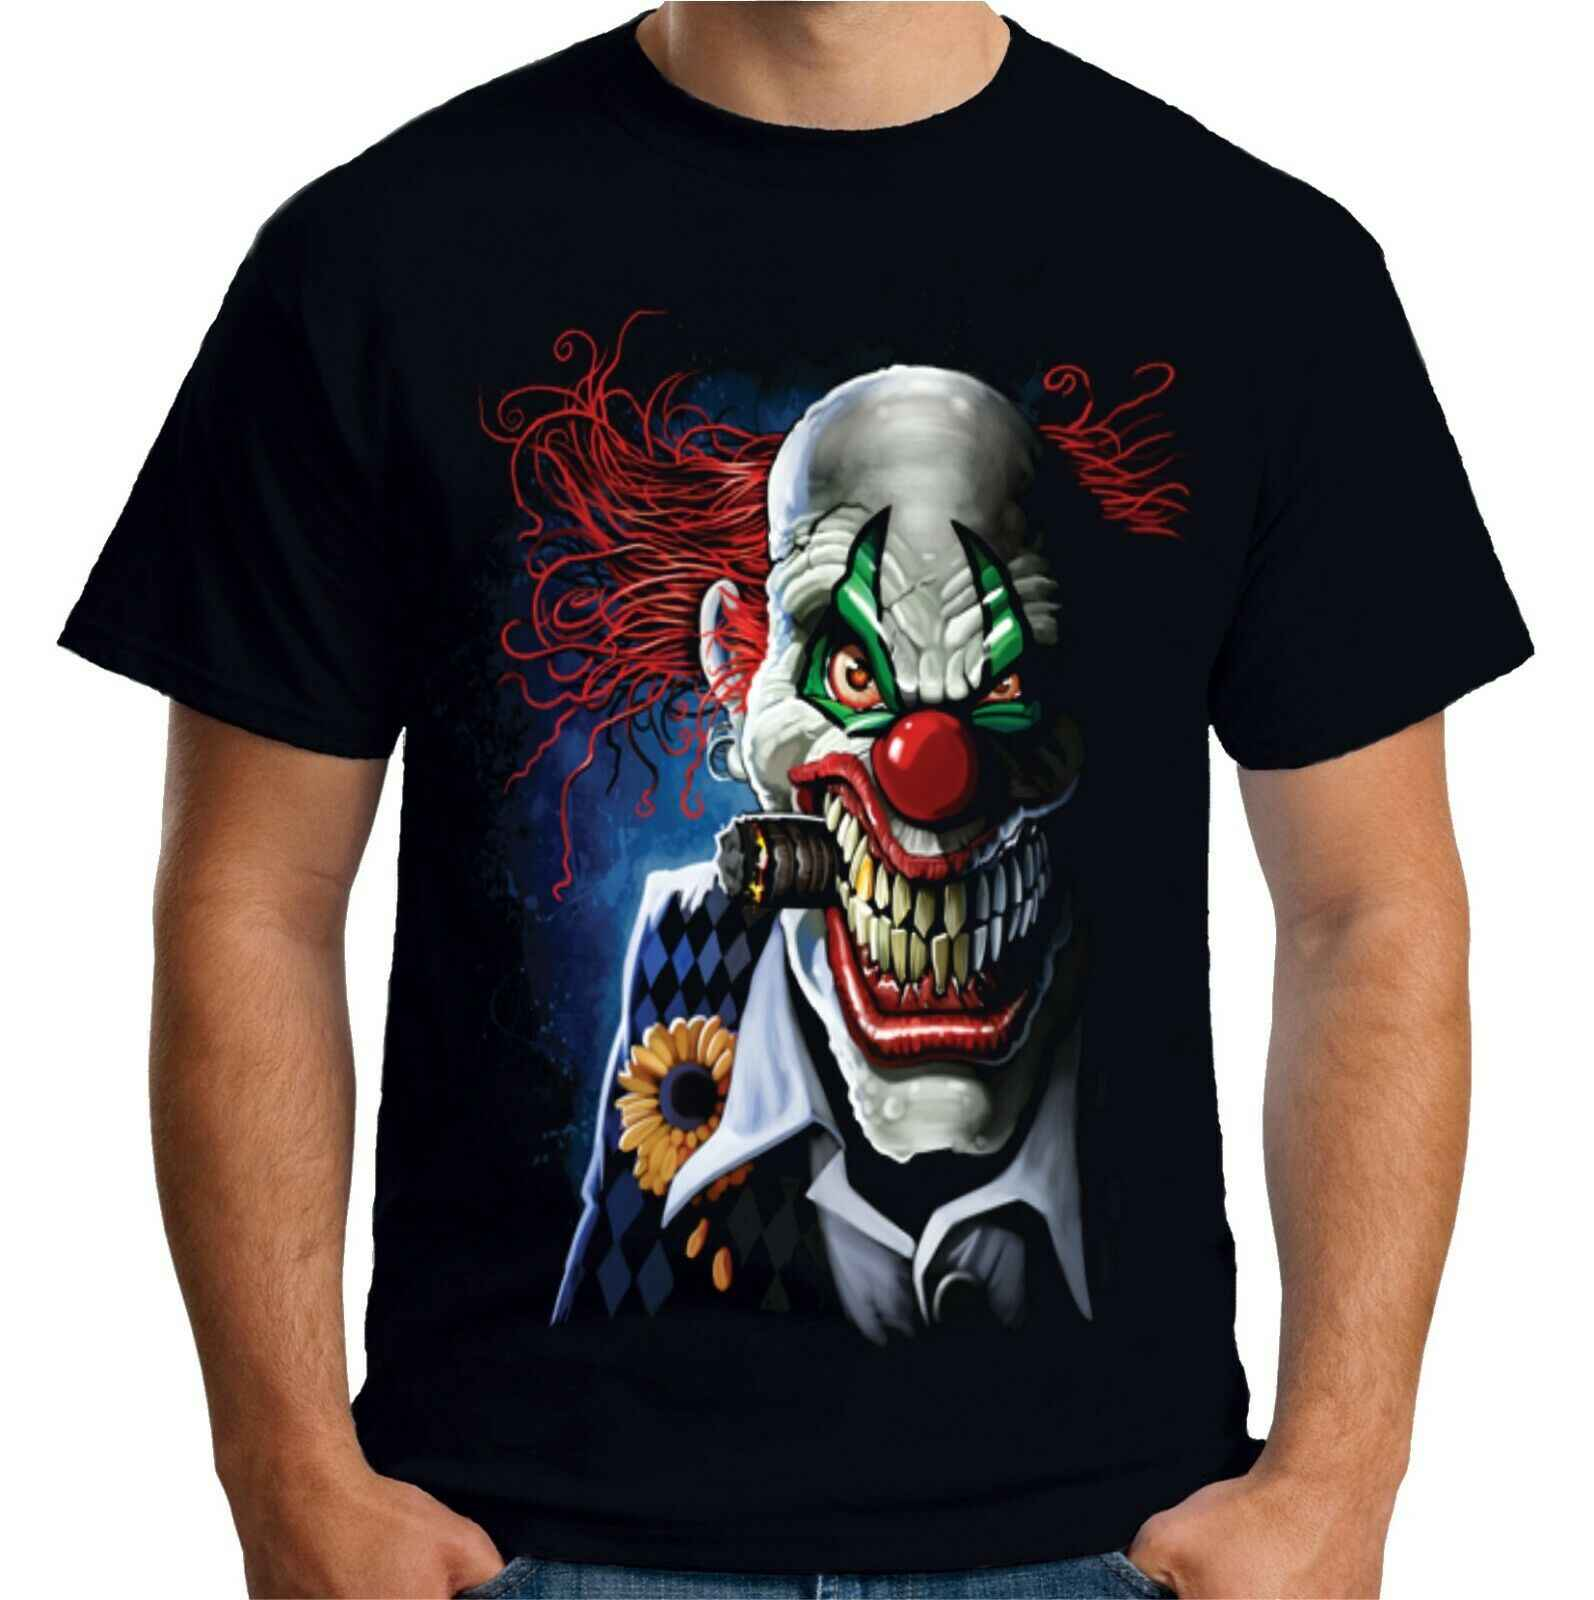 Мужские футболки с принтом злой клоун Футболка Джокер цирк Goth Horror Gothic Funny A18008